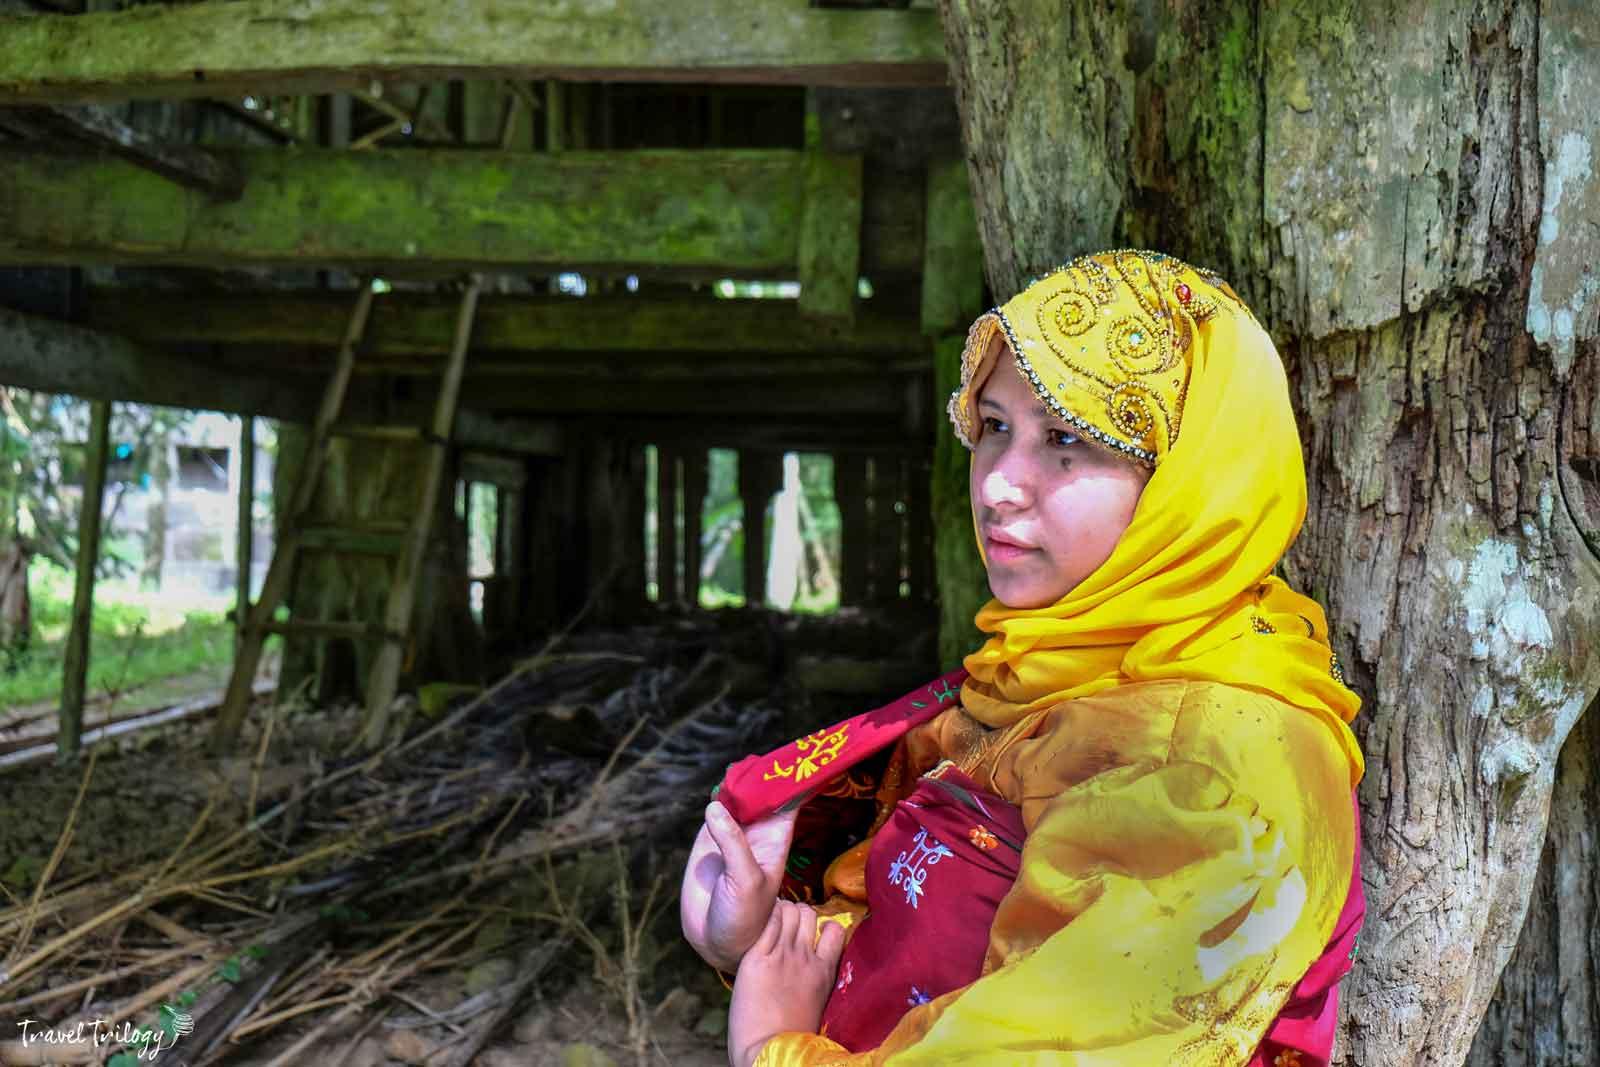 Maranao Arts and Crafts | Lanao del Sur's Living Traditions - Travel